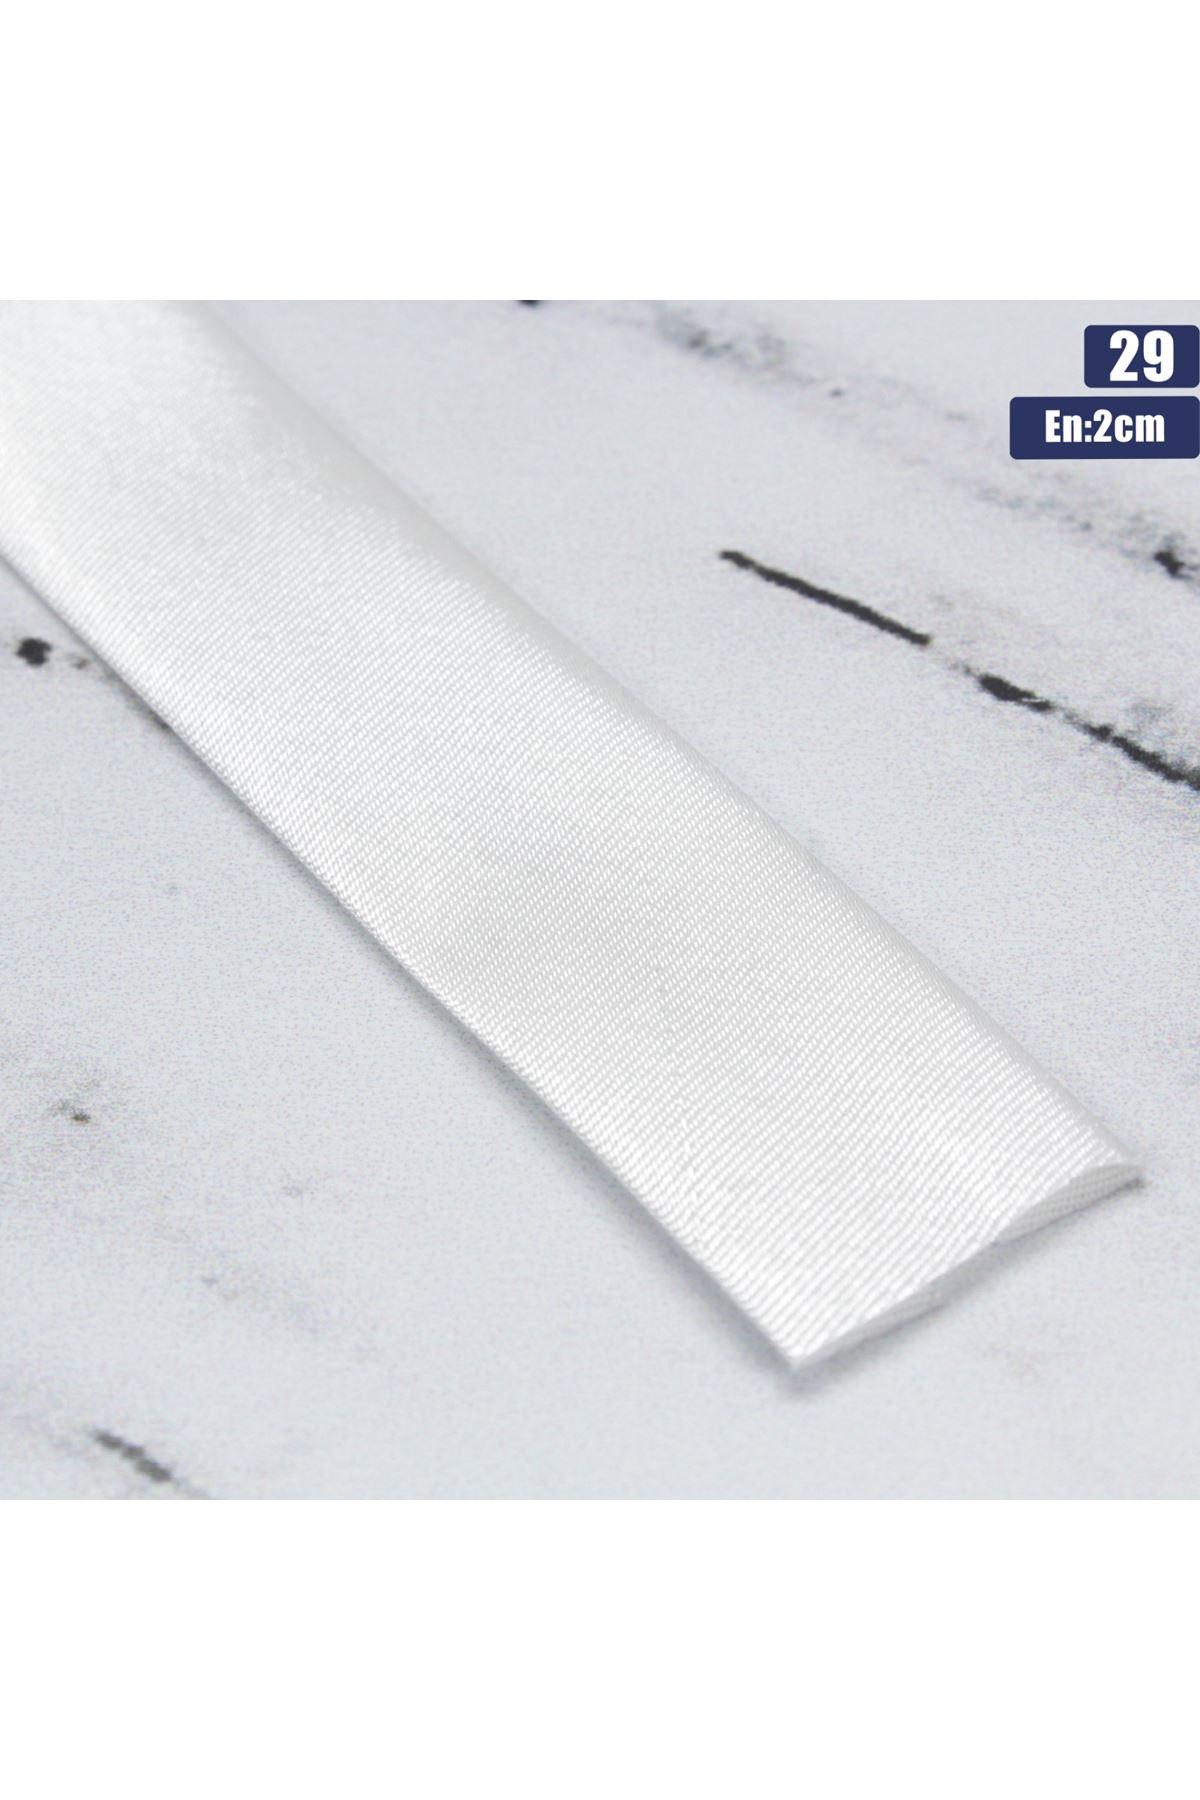 Biye - 29